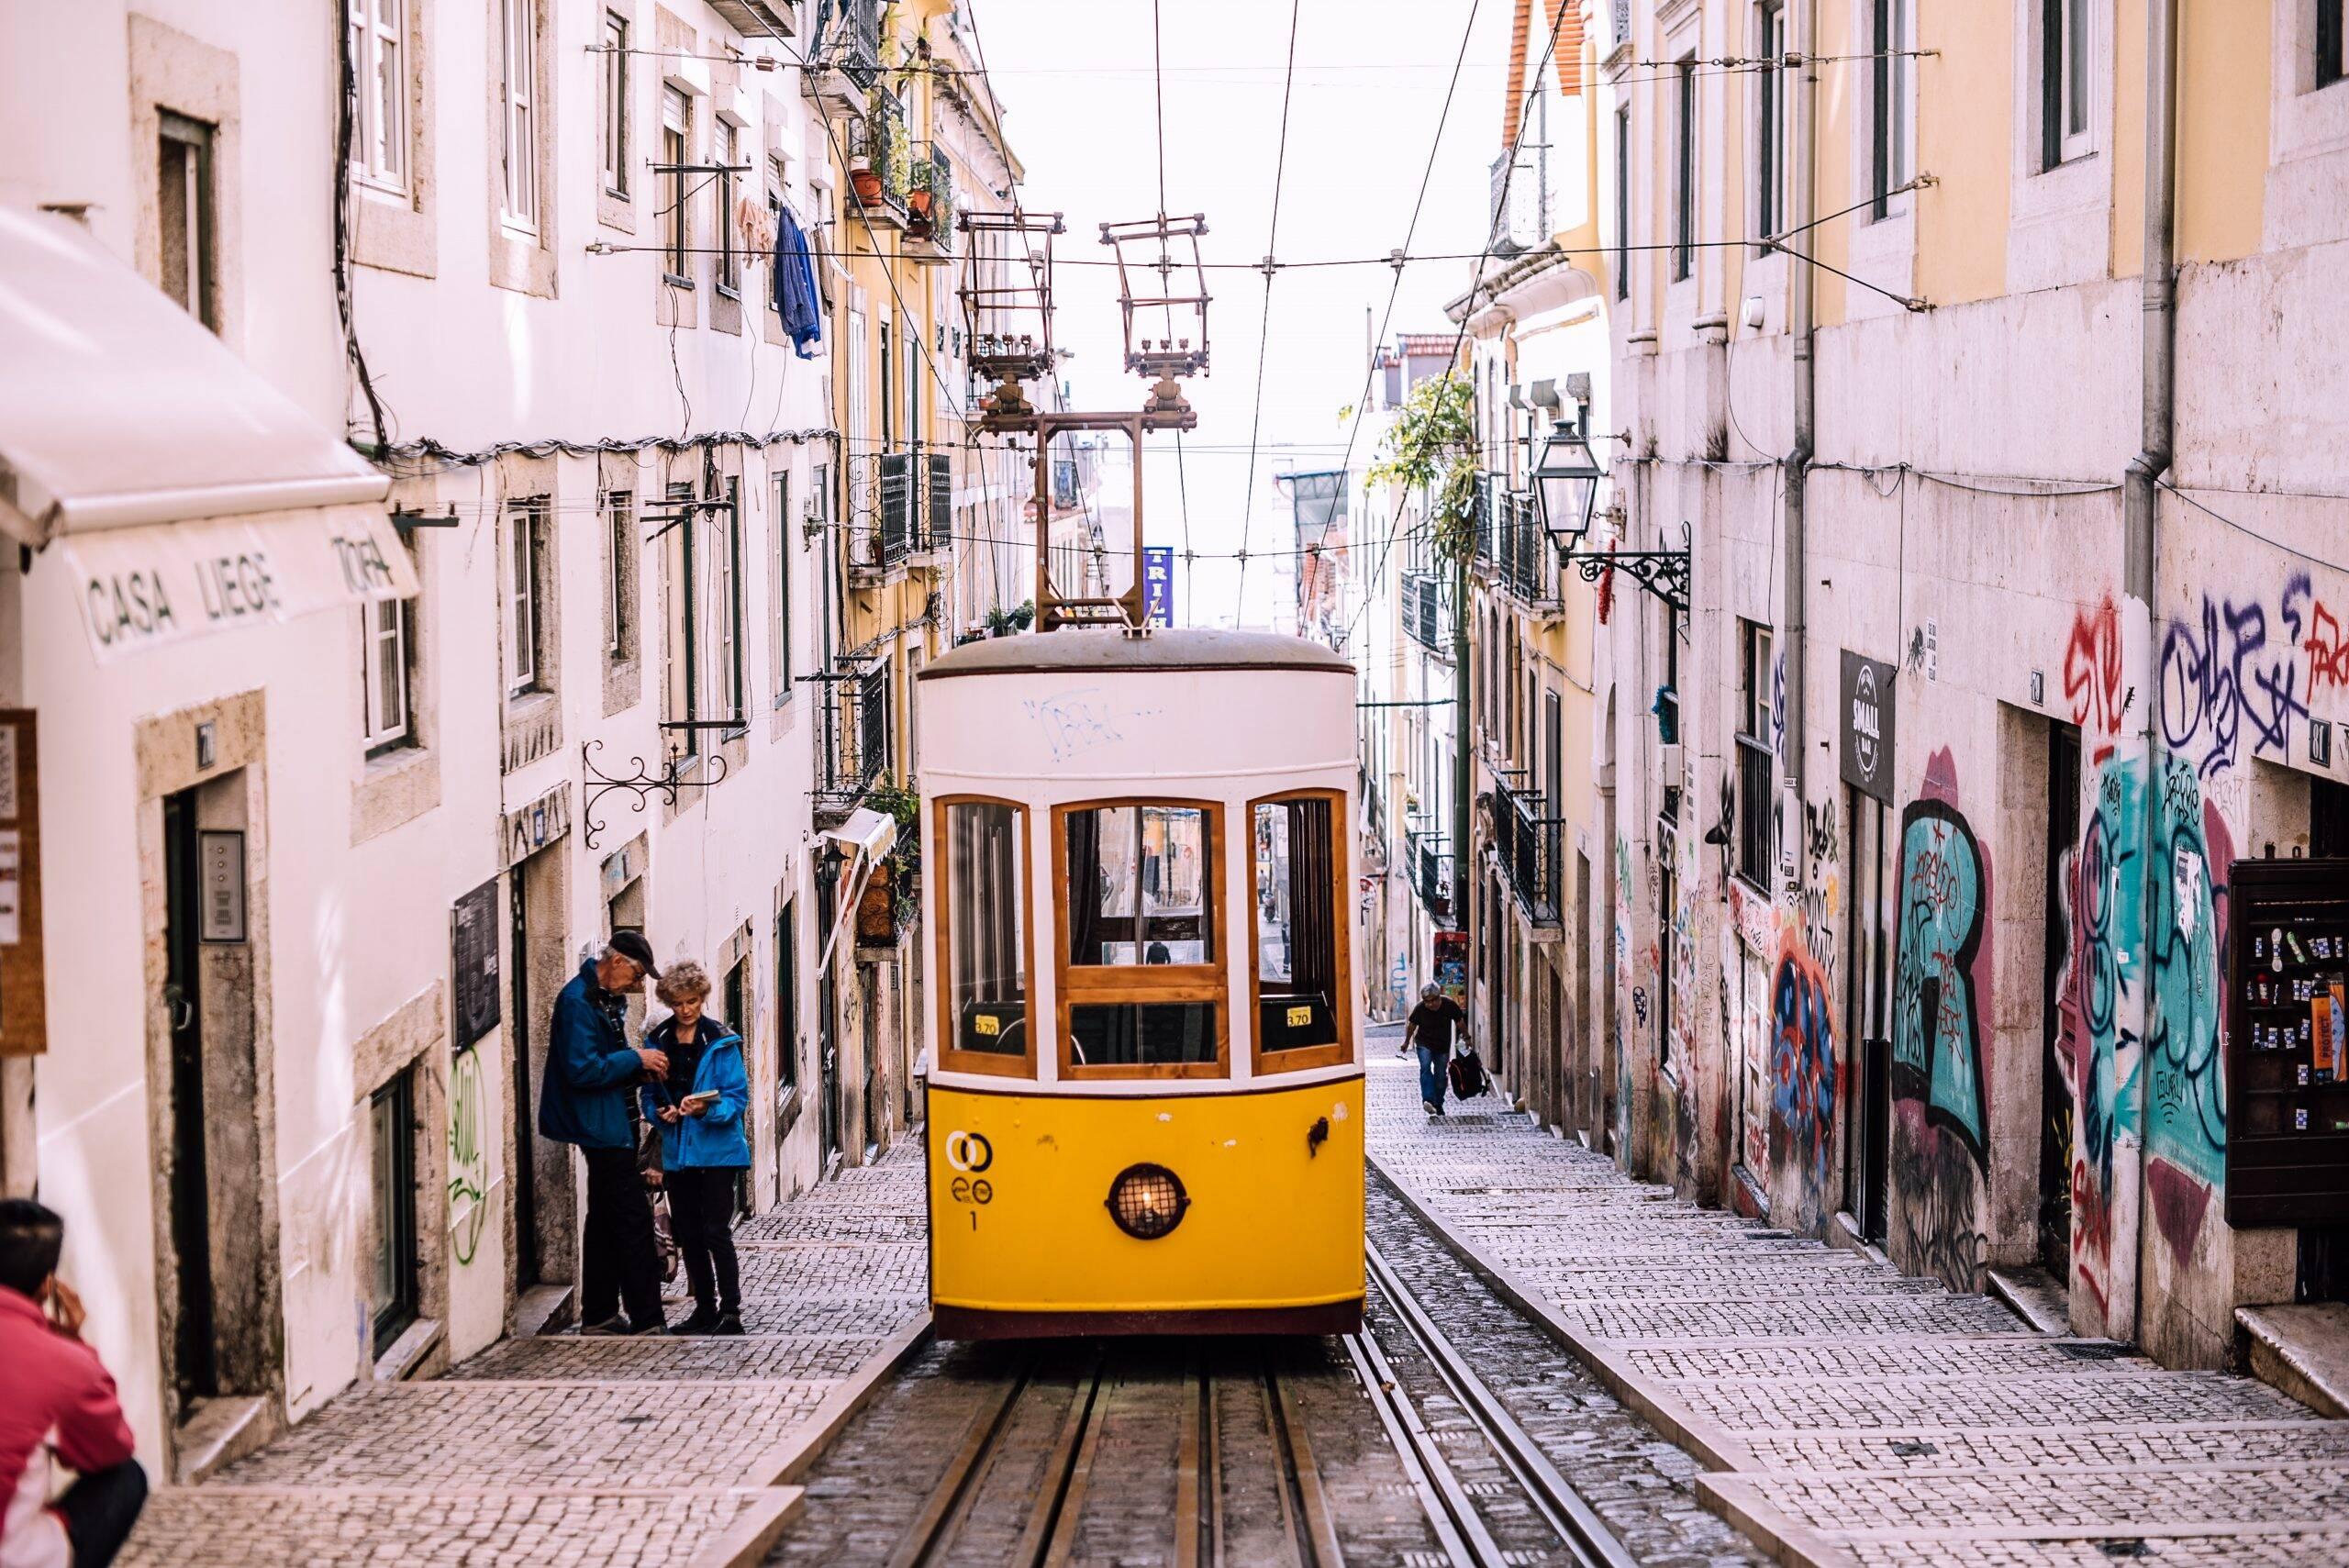 Portugal: Europa reabre fronteiras para turistas estrangeiros